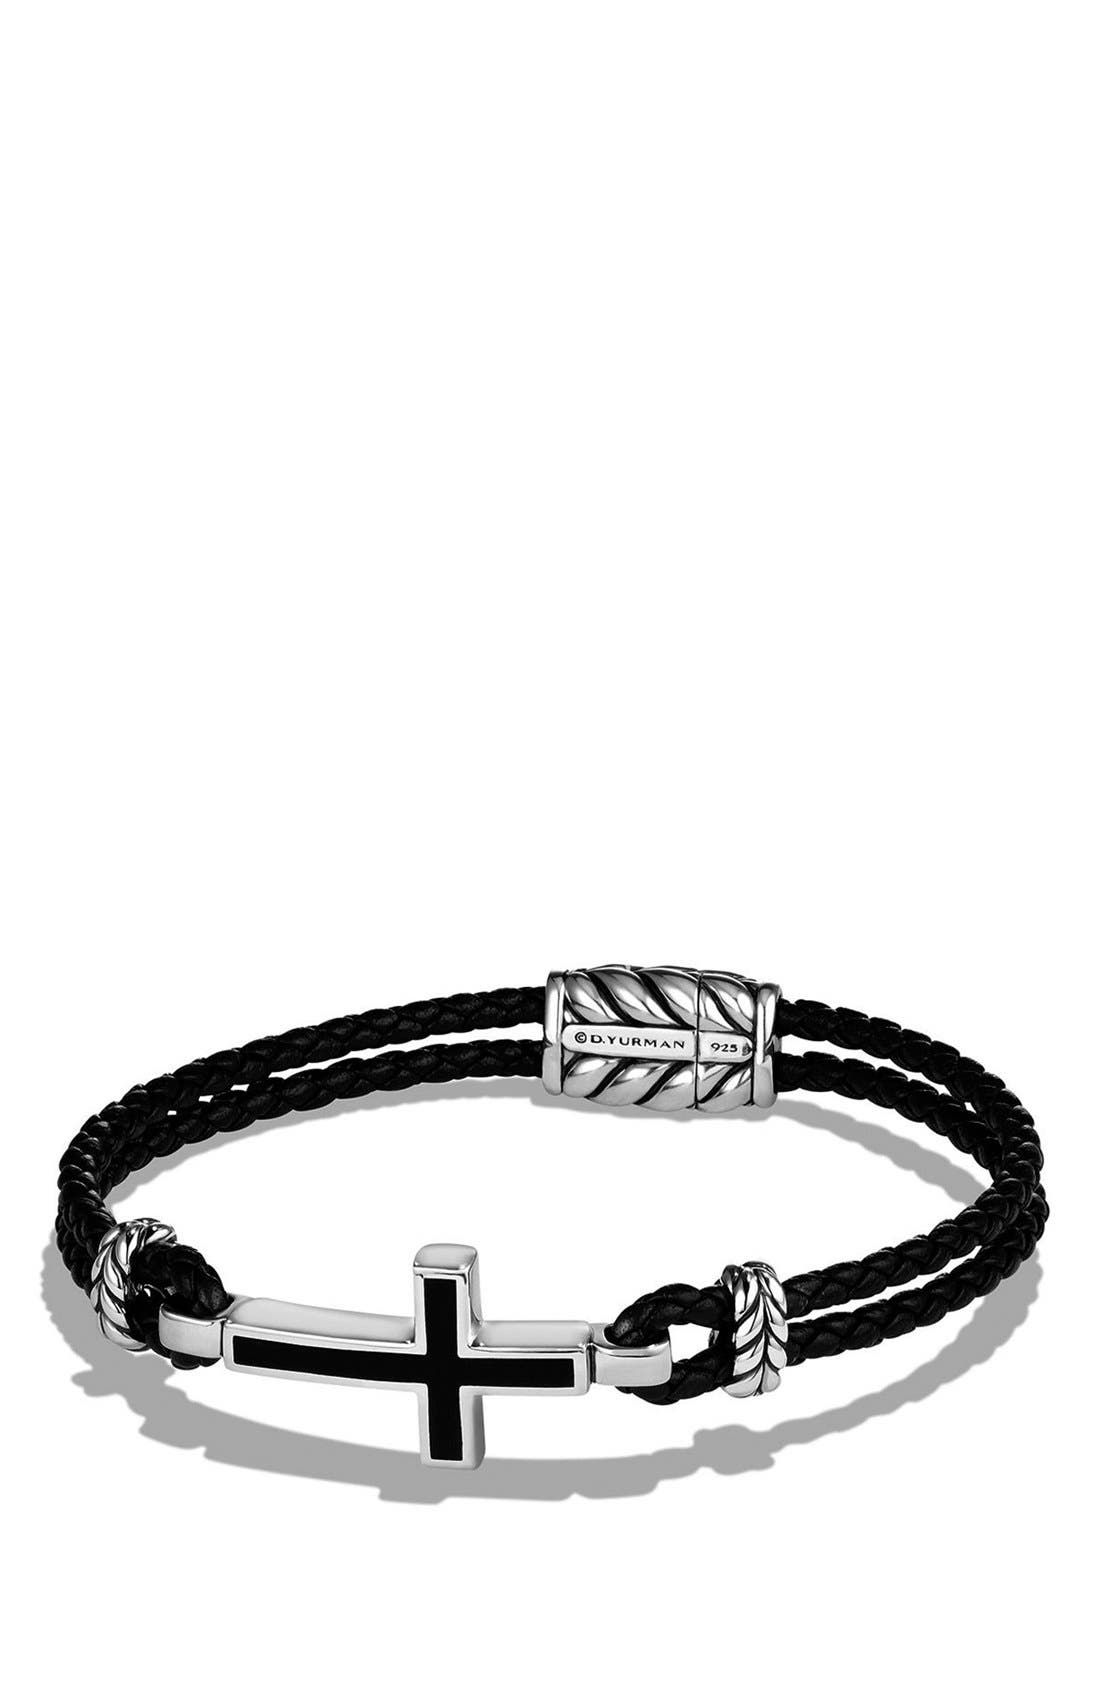 Main Image - David Yurman 'Exotic Stone' Cross Station Leather Bracelet with Black Onyx